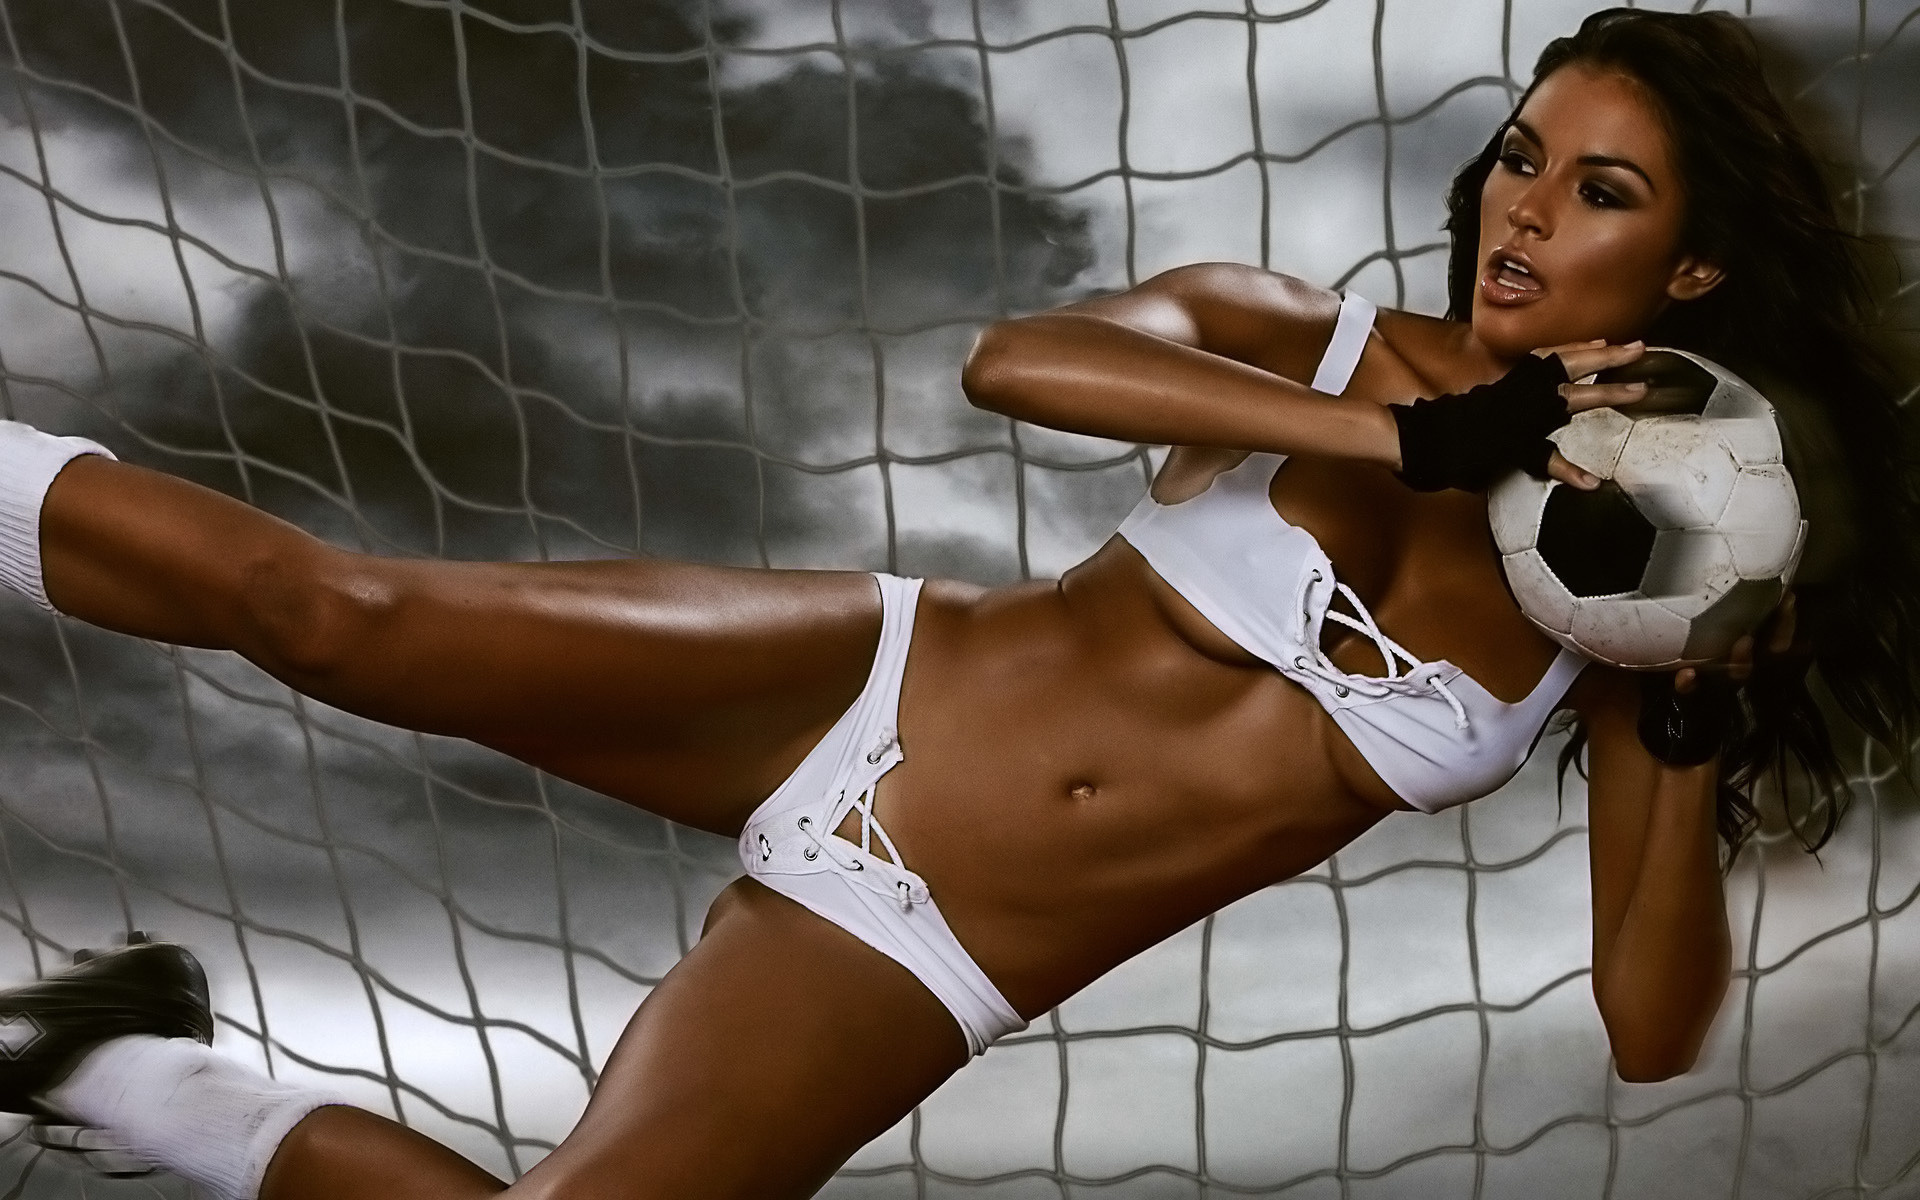 Jewel sexy girl sports bare gaping